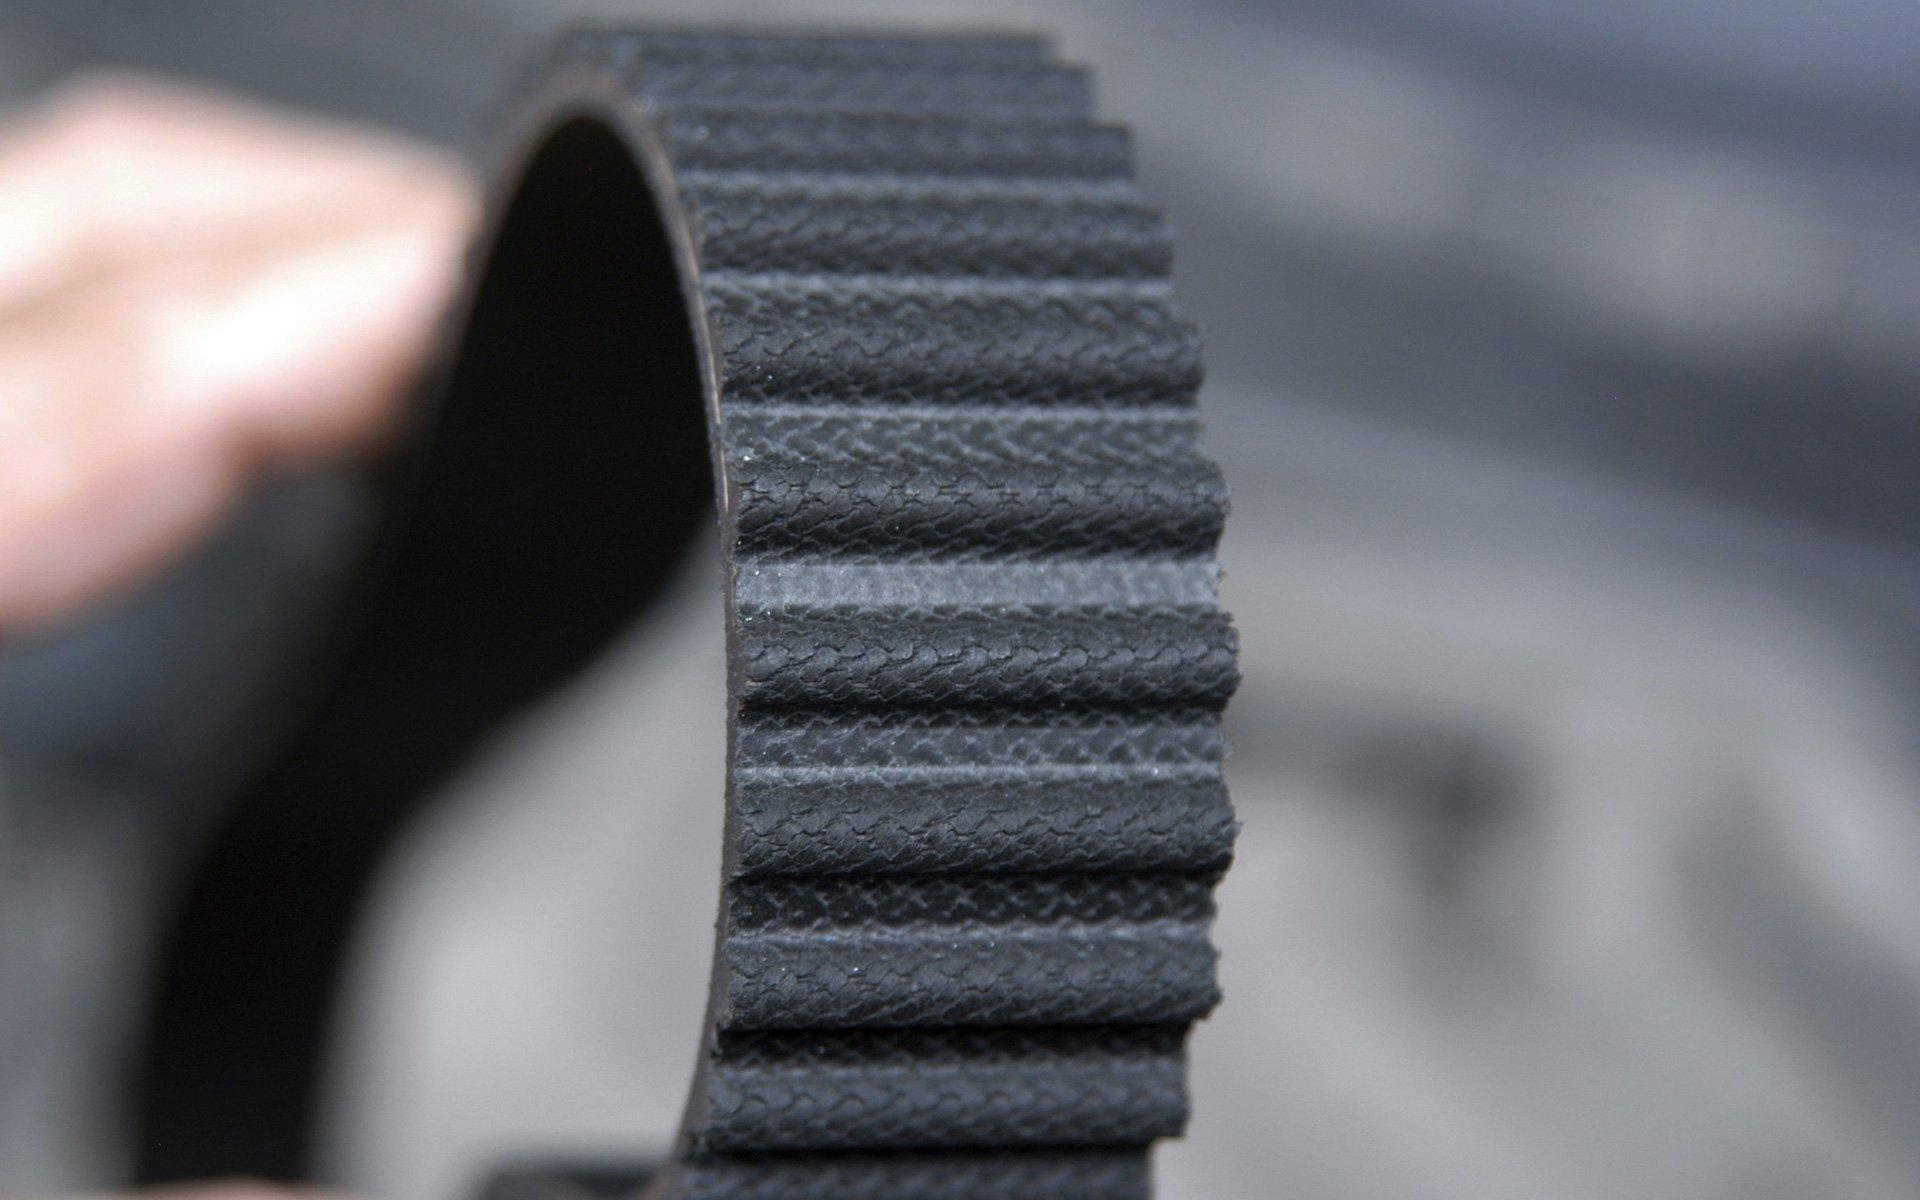 Top quality materials